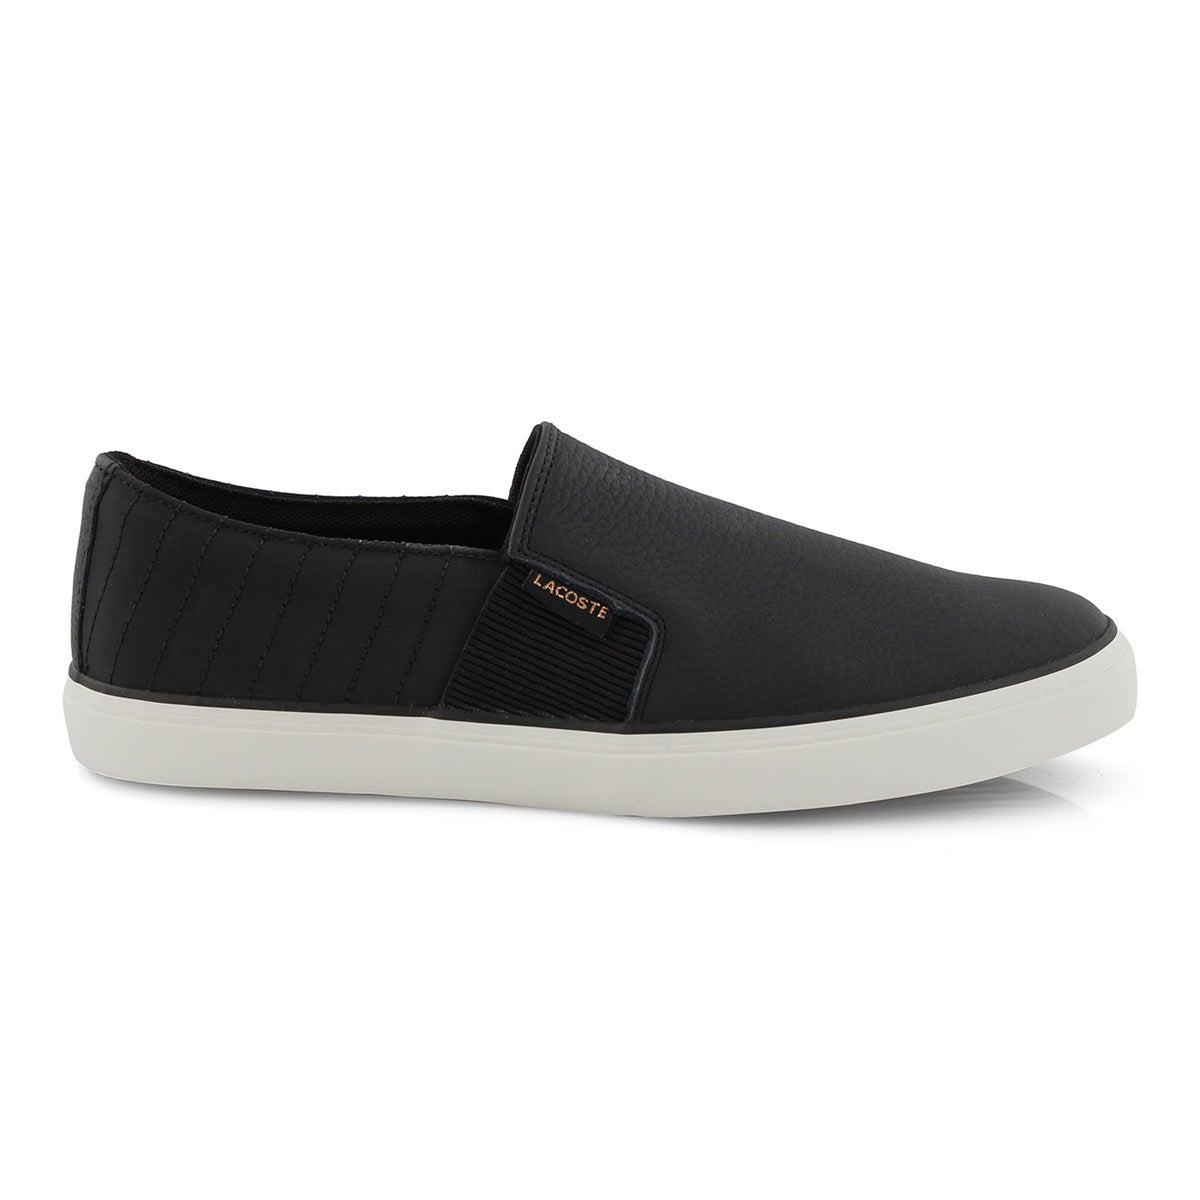 Lds Gazon 2.0 319 2 blk slip on sneaker